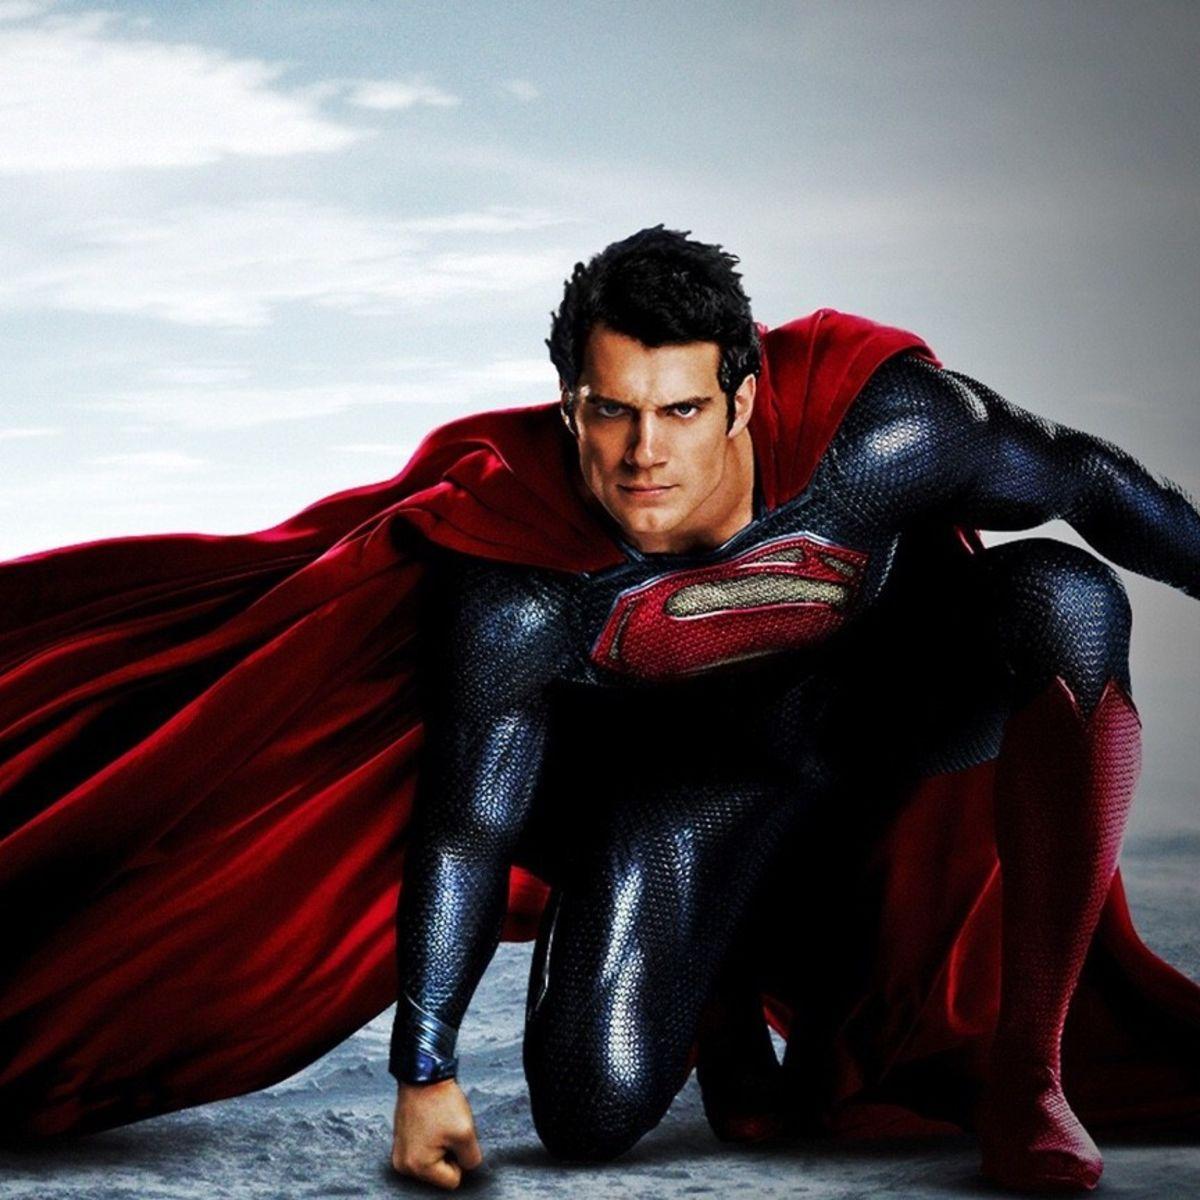 supermancape.jpg